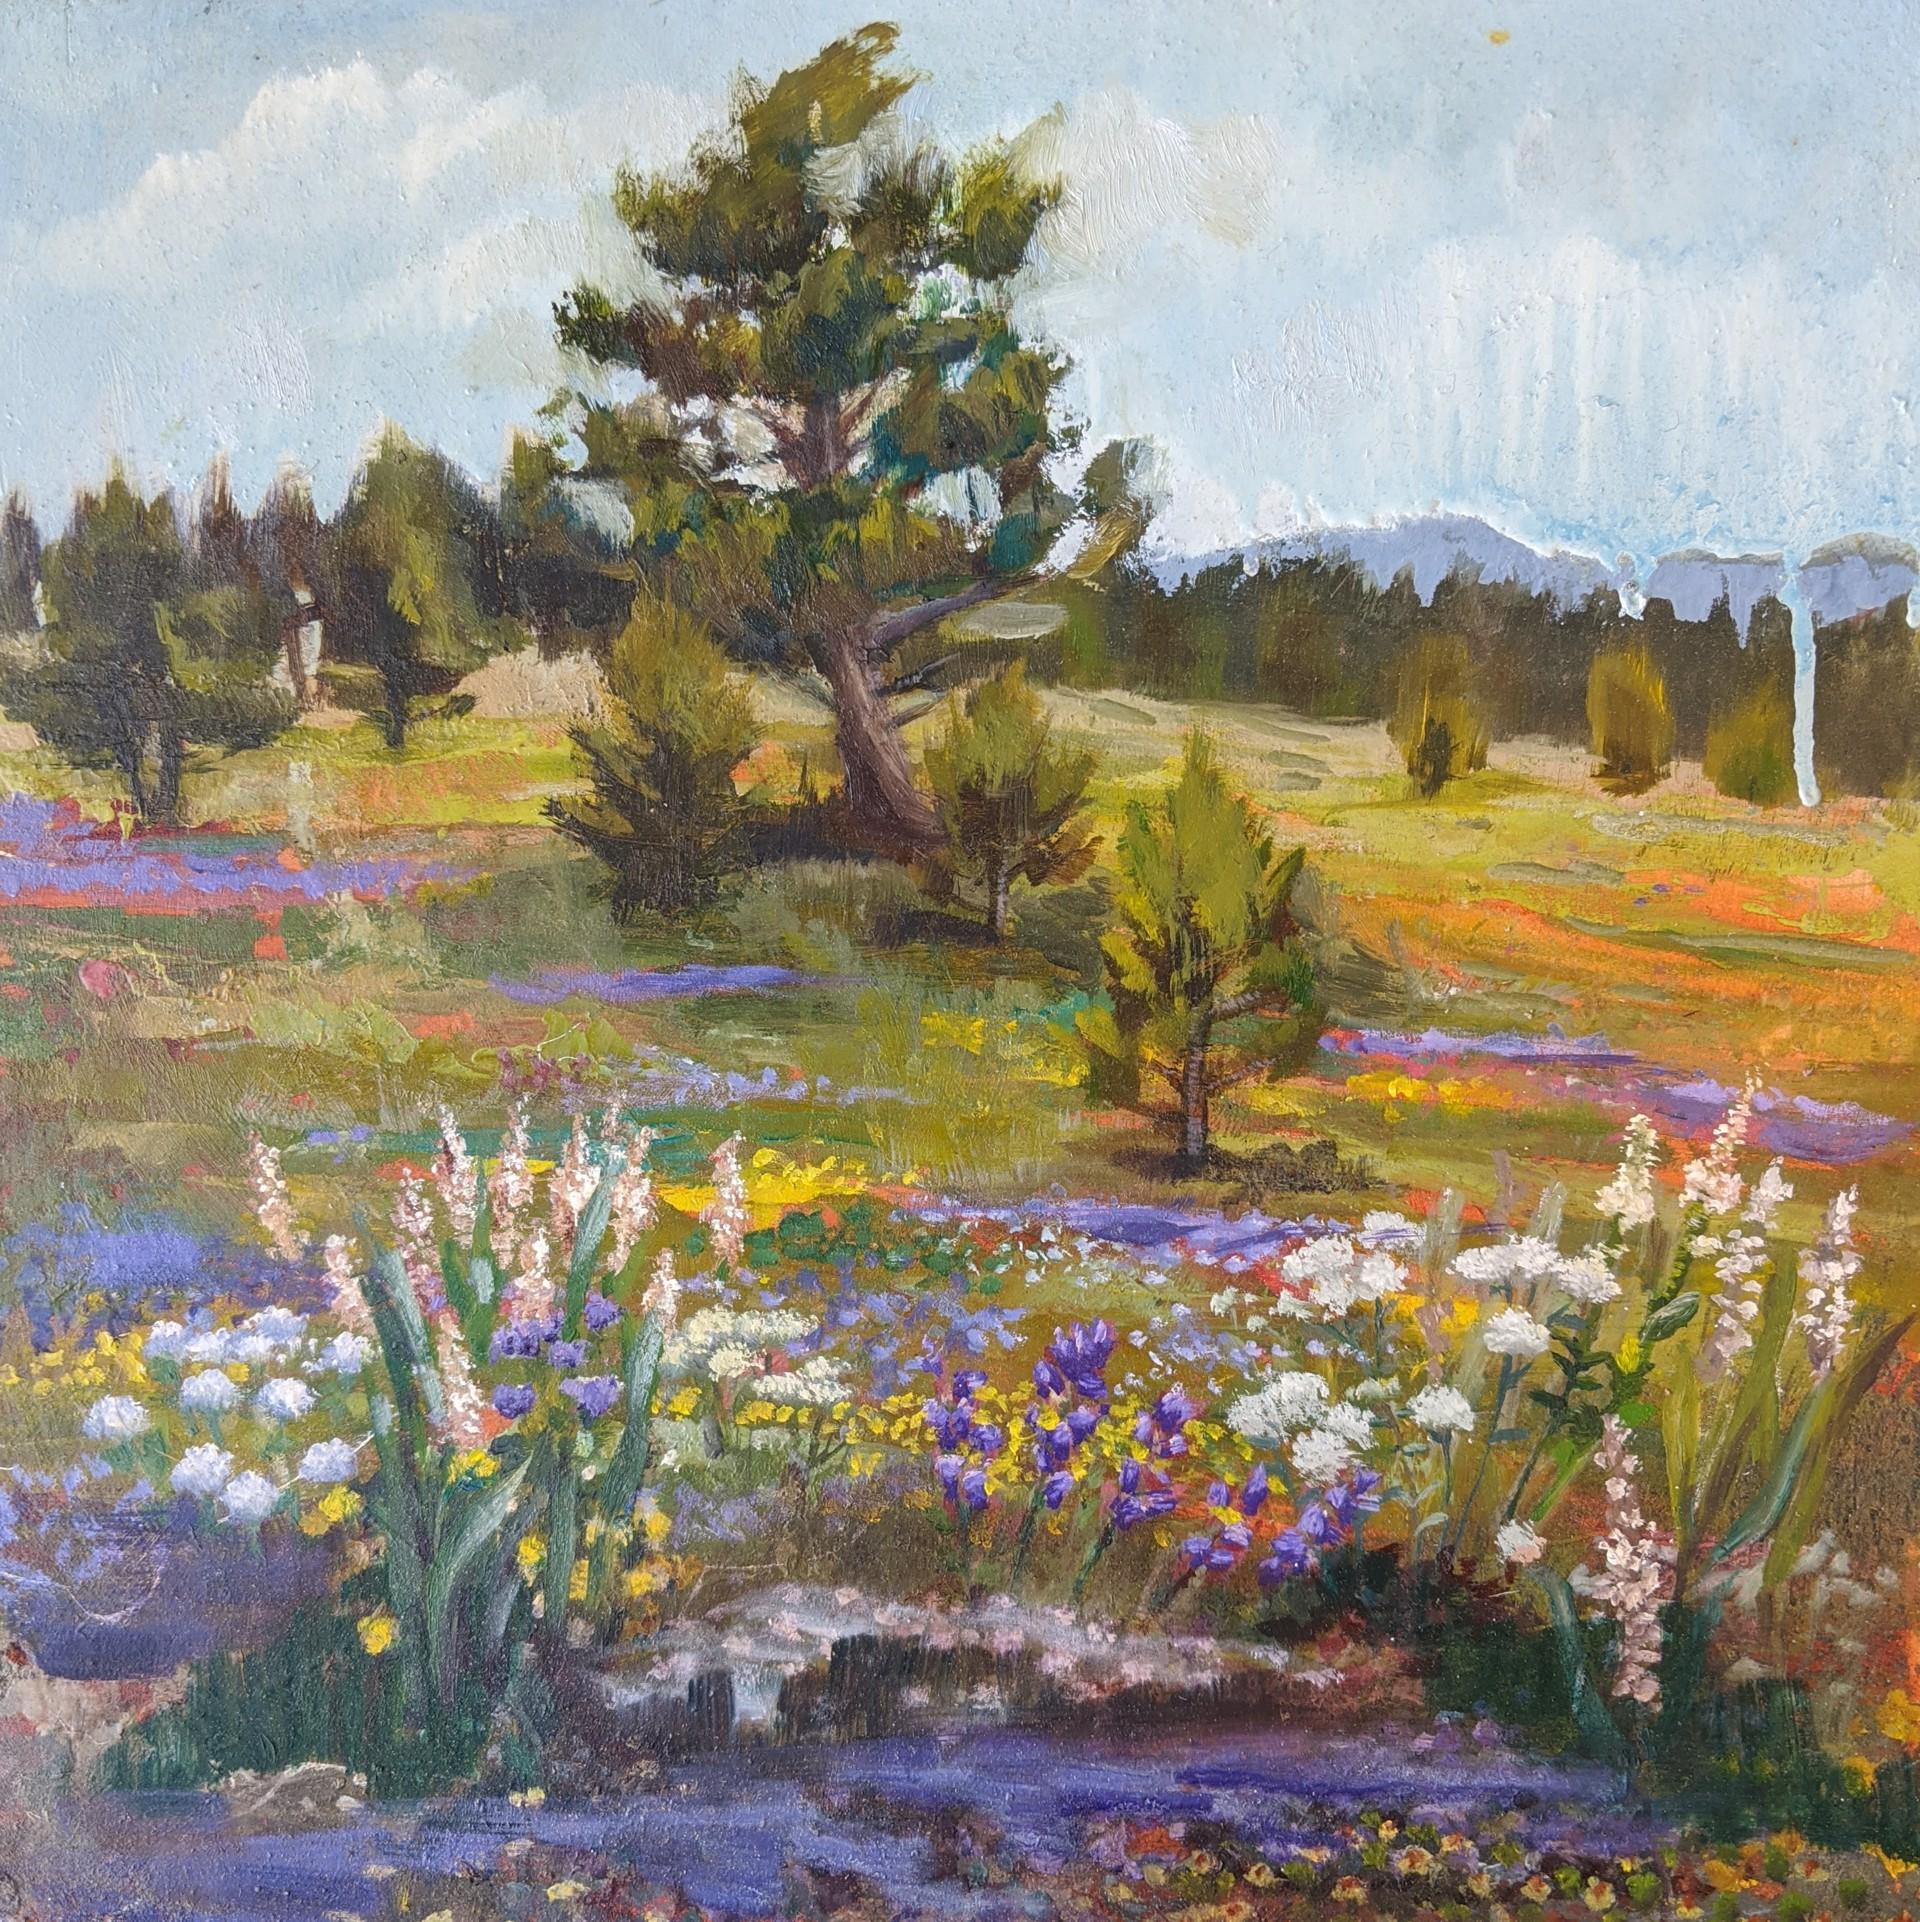 Landscape II by Caitlin Hurd